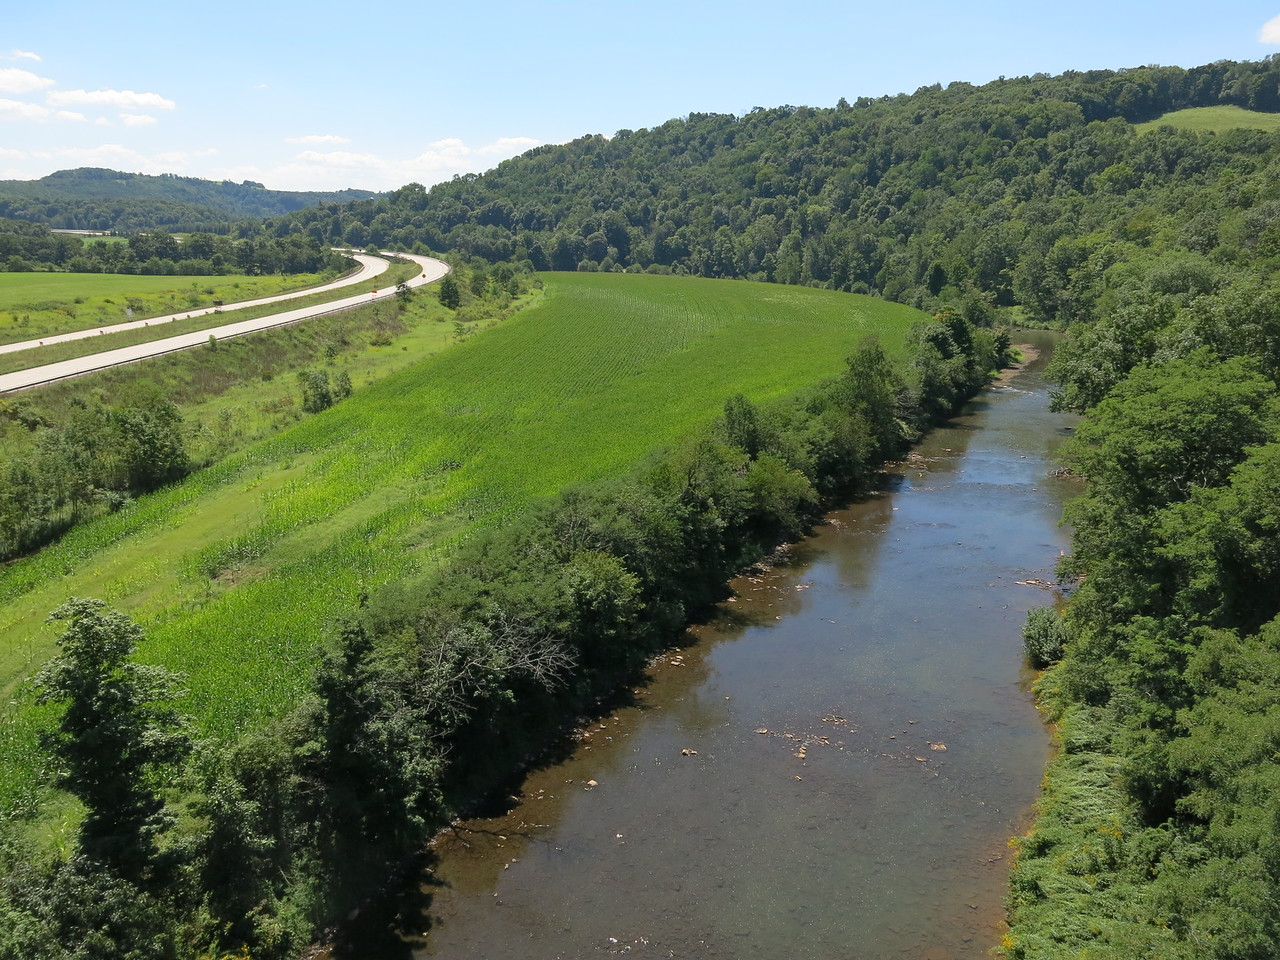 US Highway 219 adjacent to the Casselman River